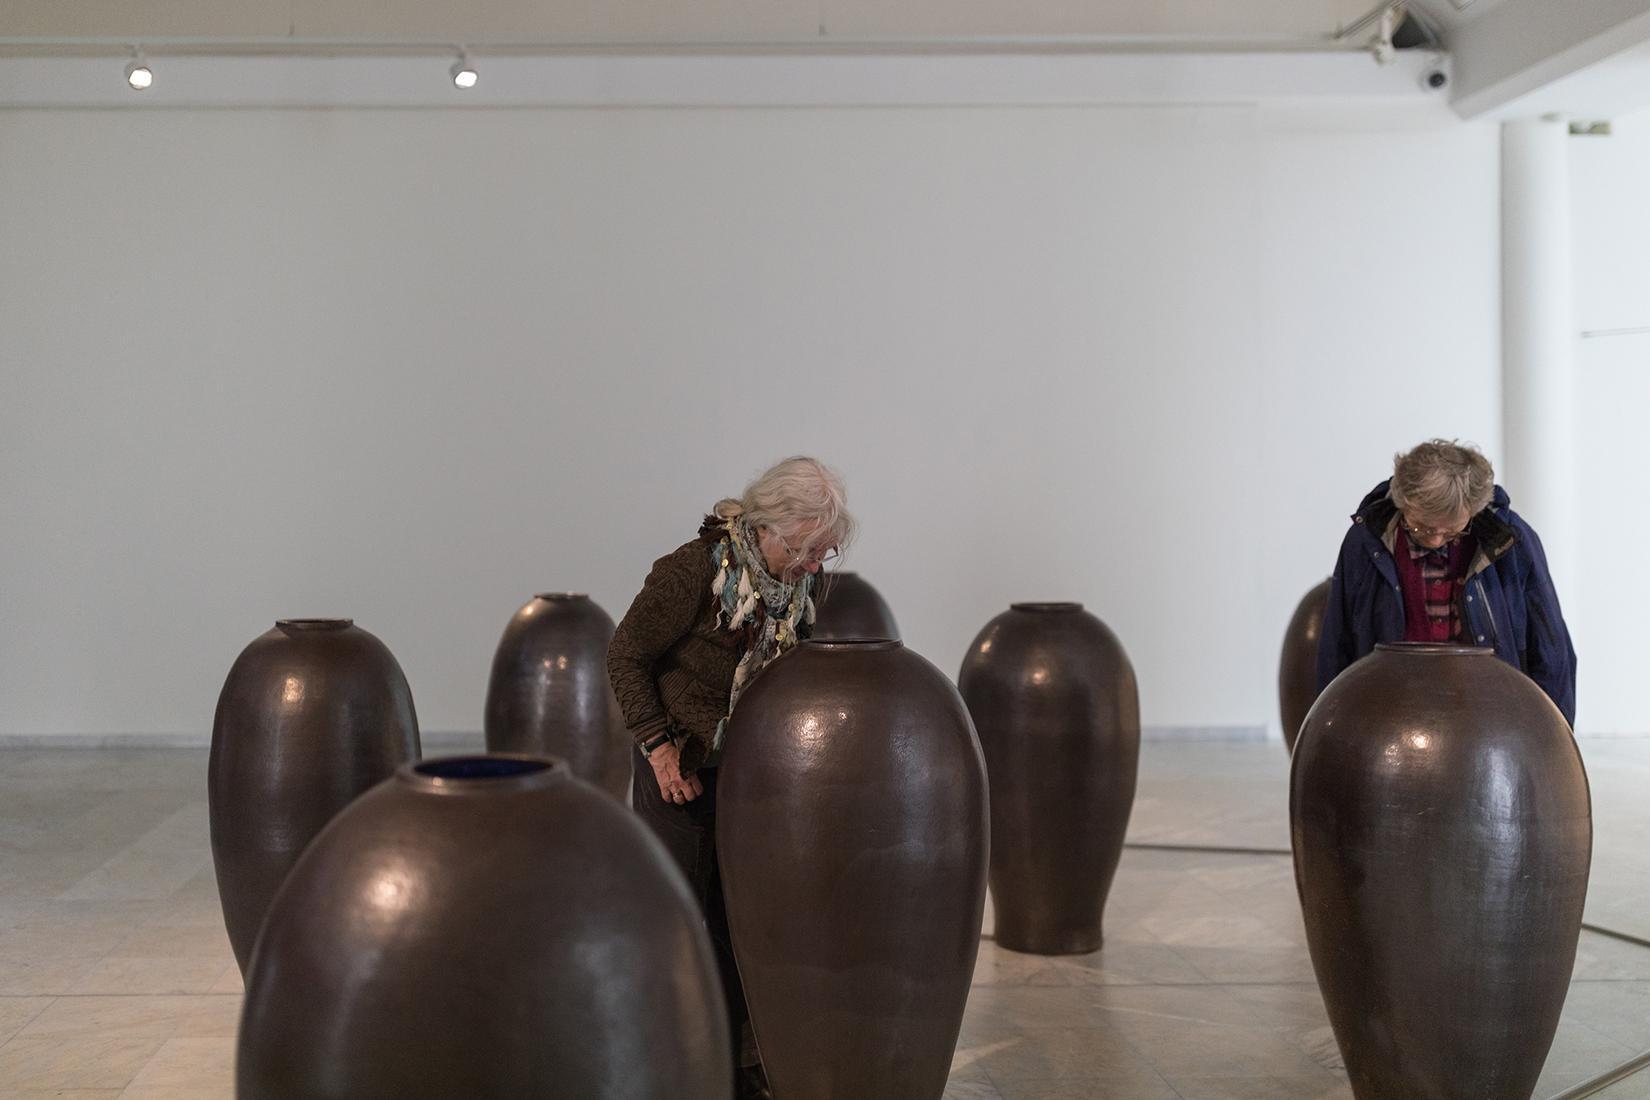 17 November - 11 March 2018 - Stavanger Art Museum (MUST), Stavanger, Norway - Nathalie Djurberg & Hans Berg: Dark Side of the Moon -  - Exhibitions